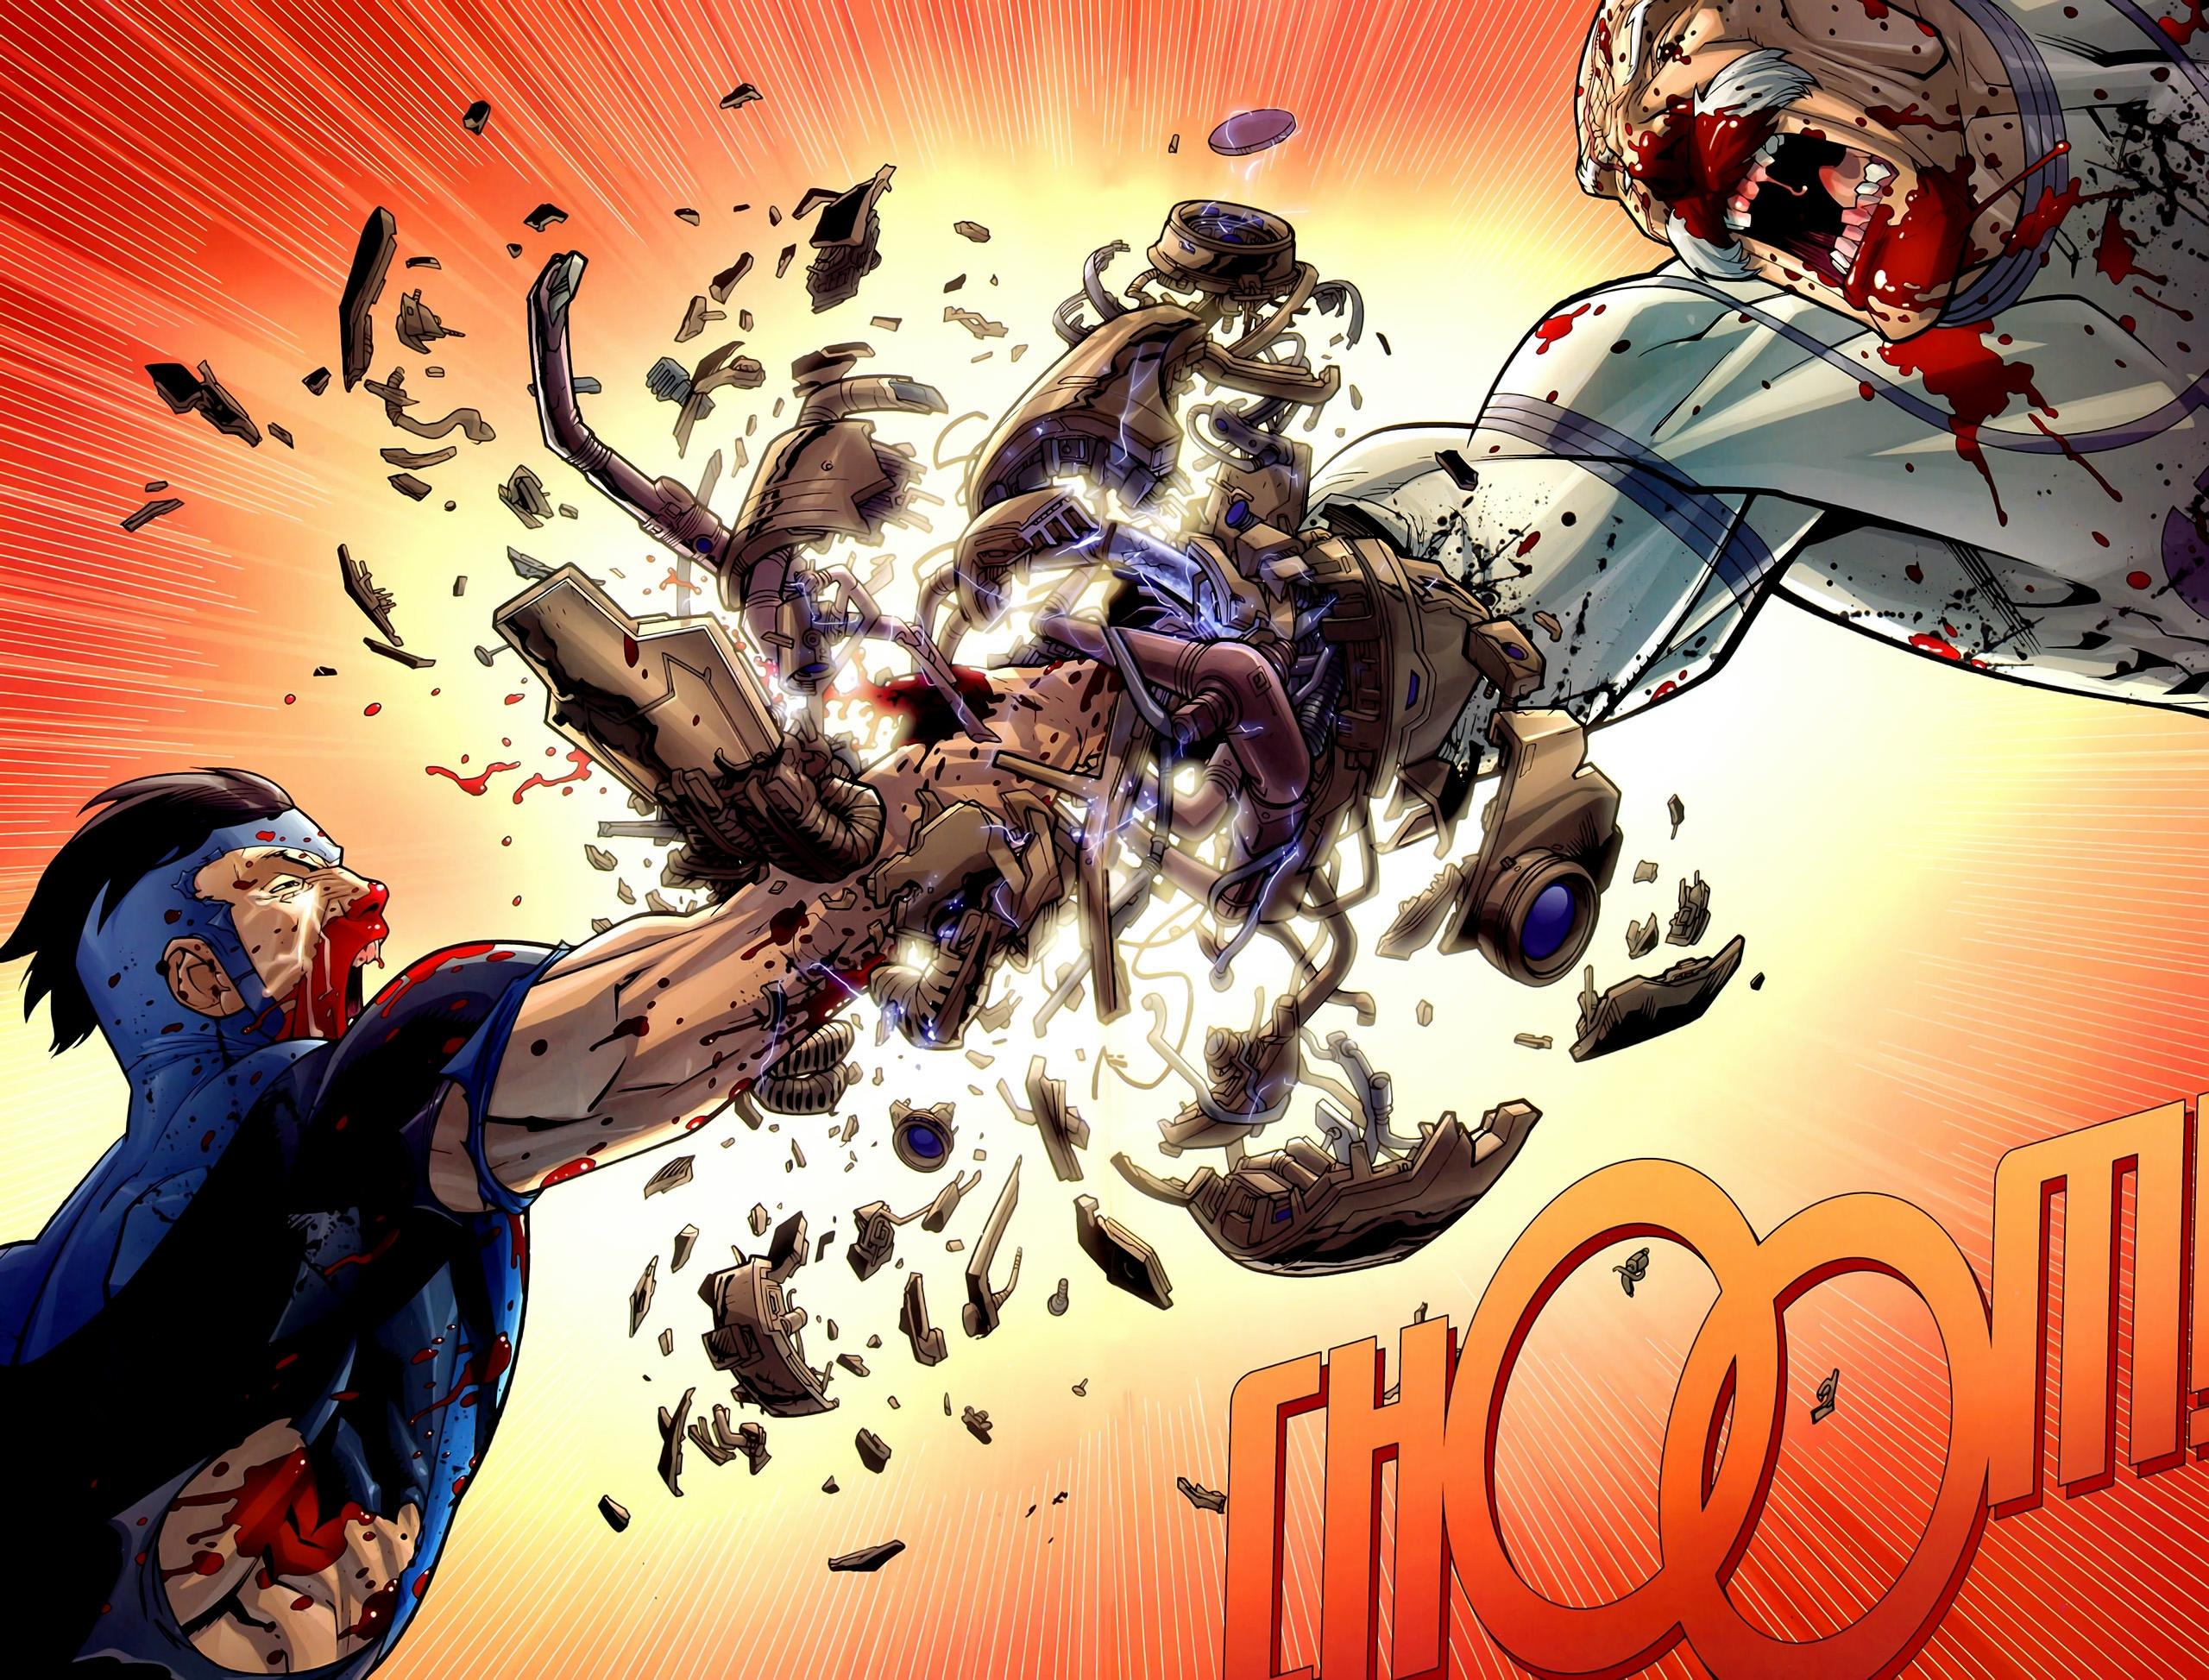 Najlepszy komiks superbohaterski – Za co kocham Invincible